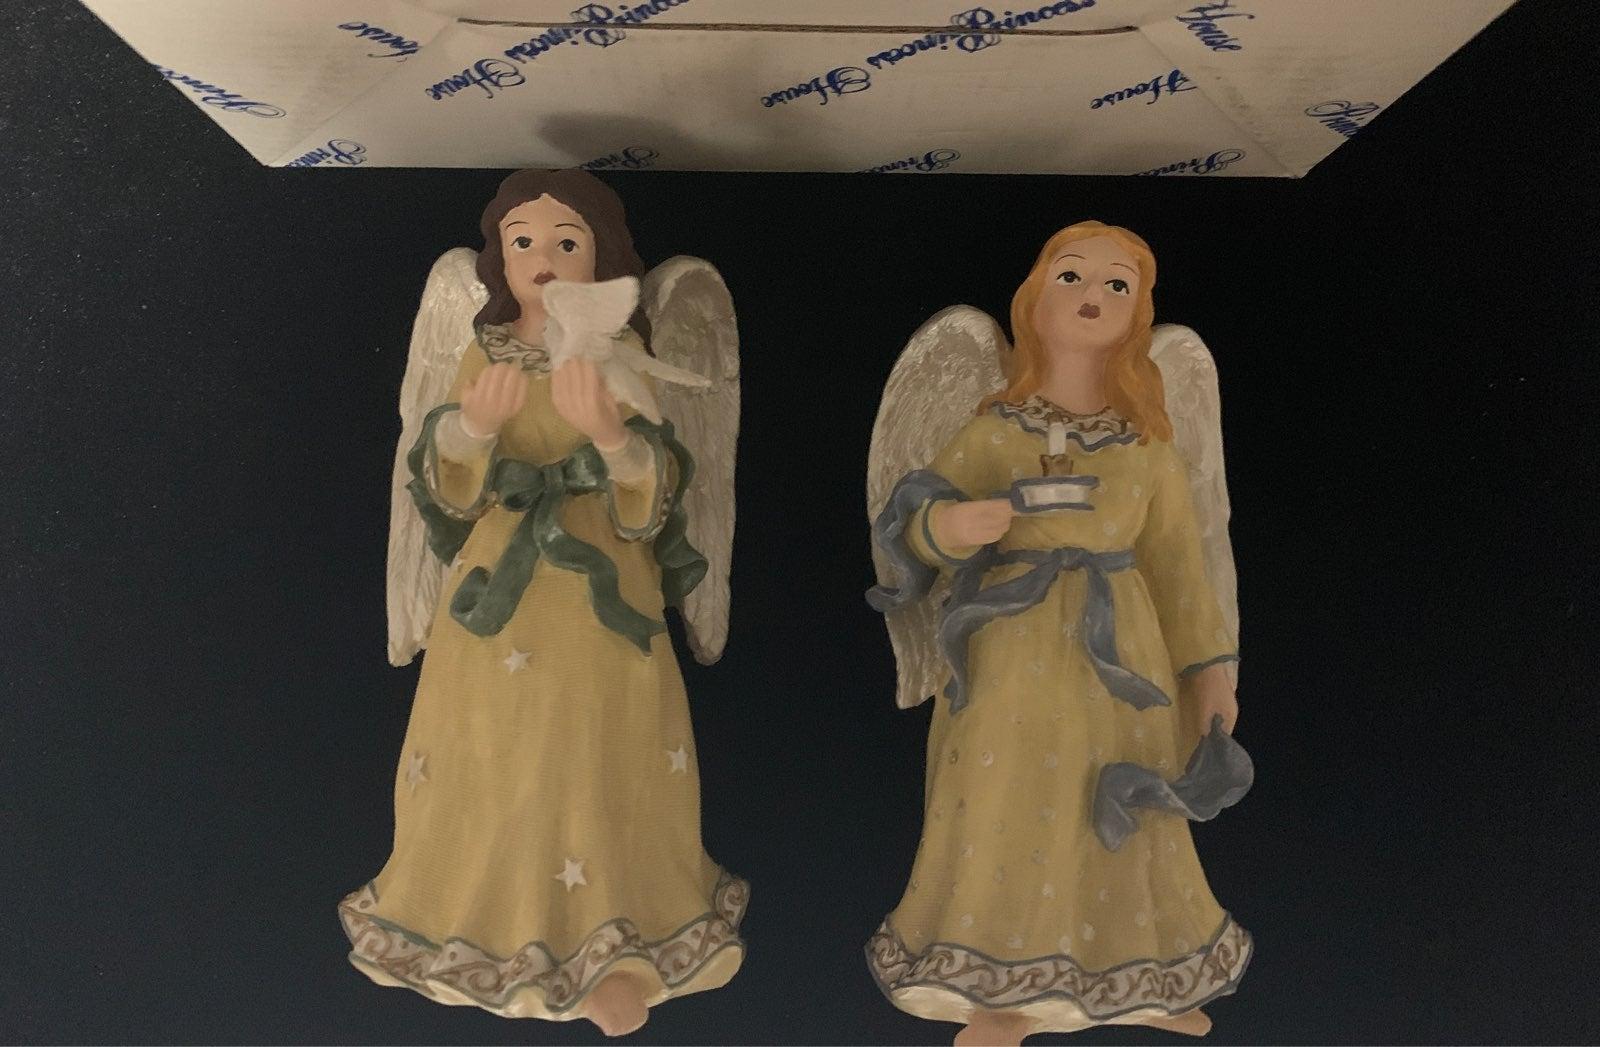 Princess house Pair of Angel Figurines